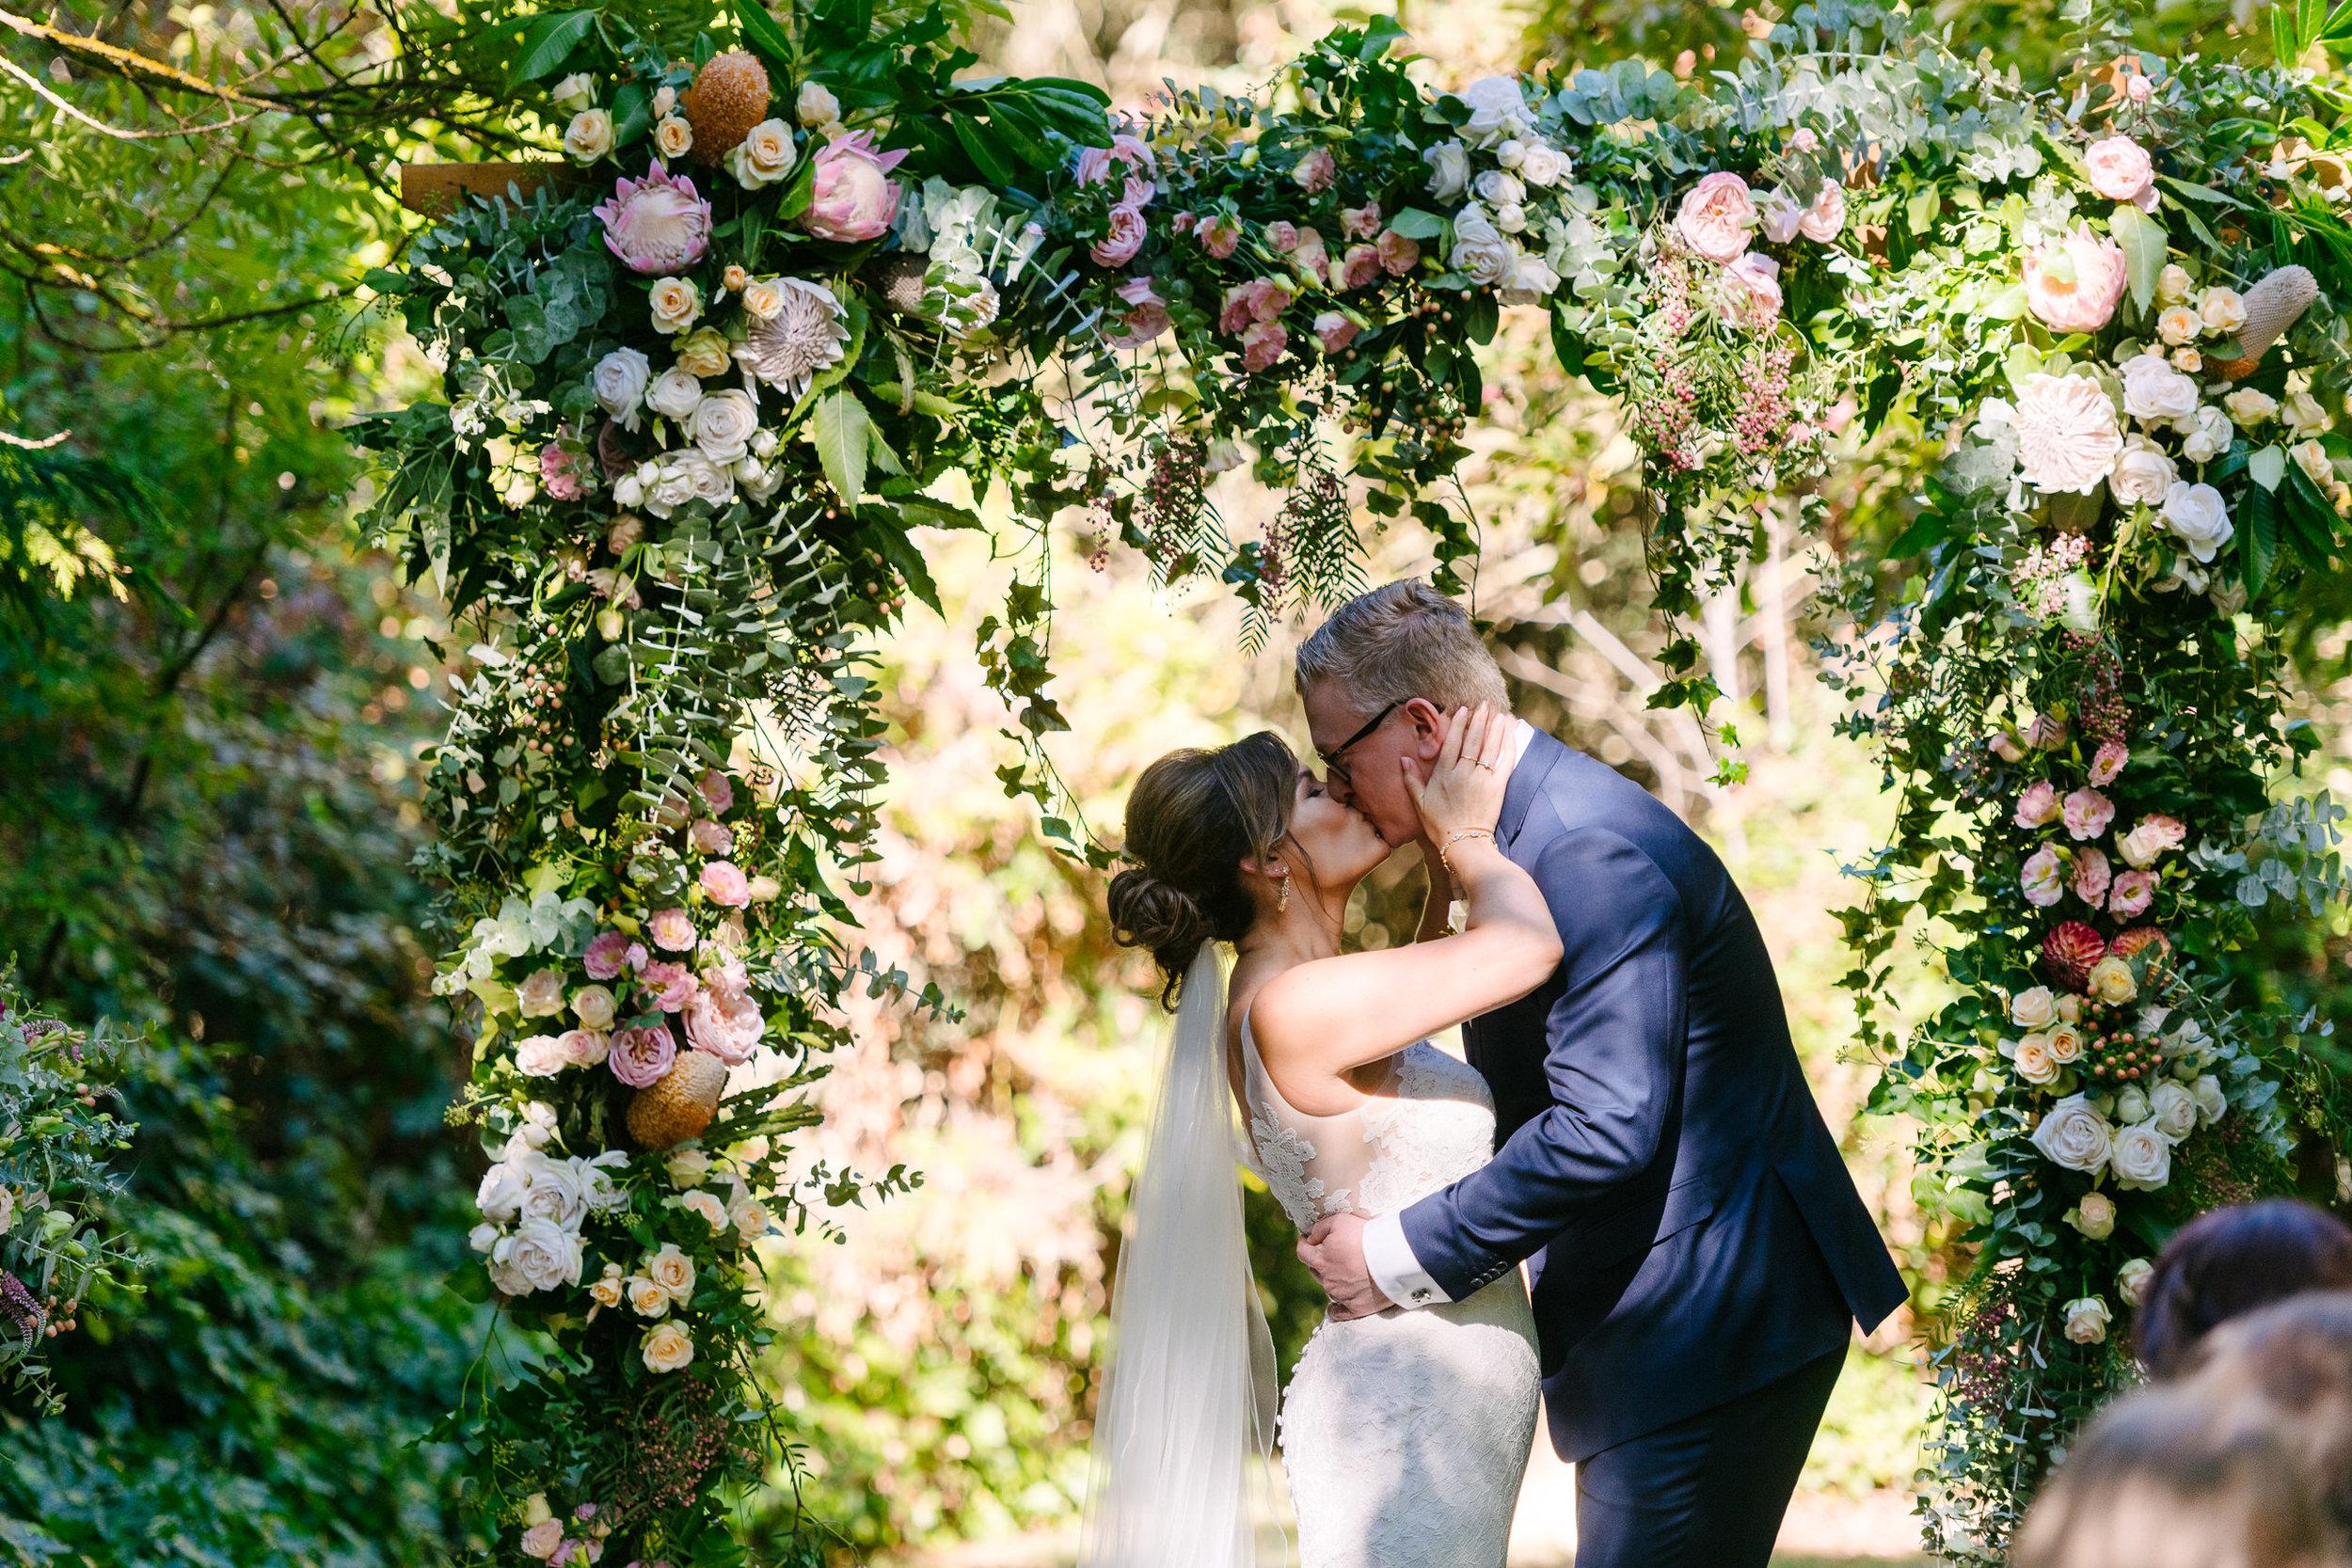 Justin_And_Jim_Photography_Chateau_Dore_Bendigo_Wedding42.JPG